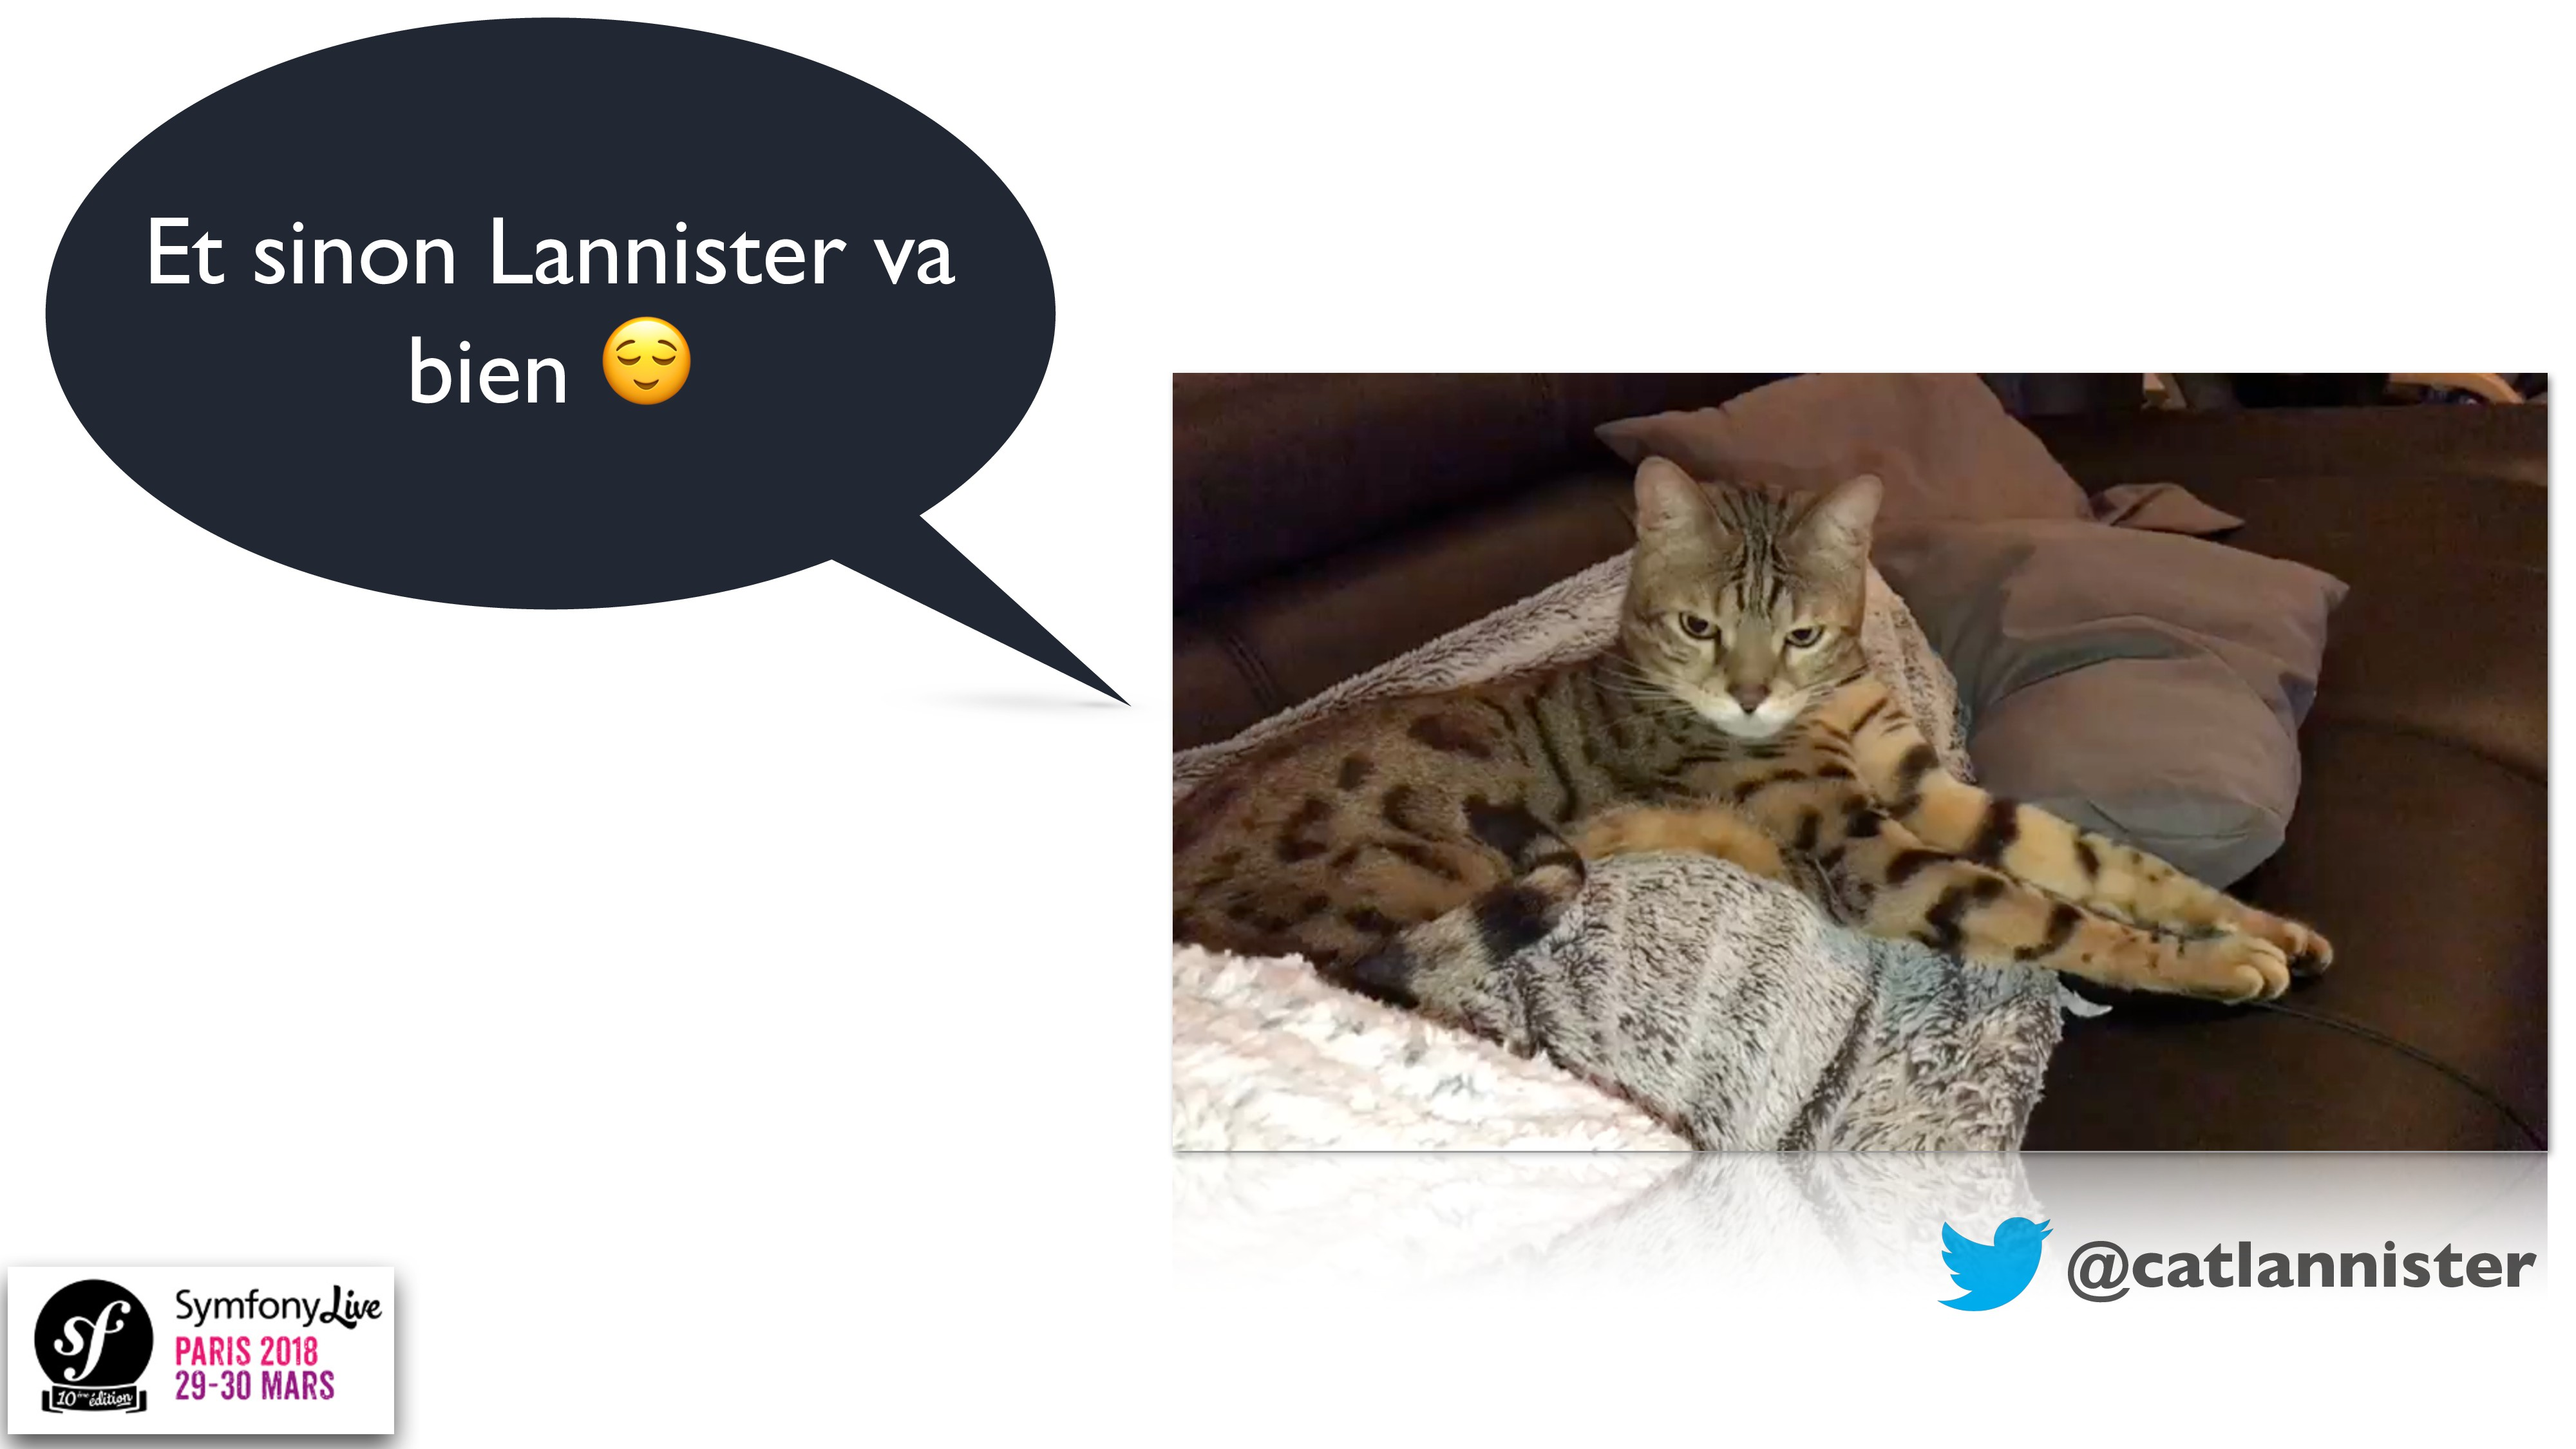 @catlannister Et sinon Lannister va bien